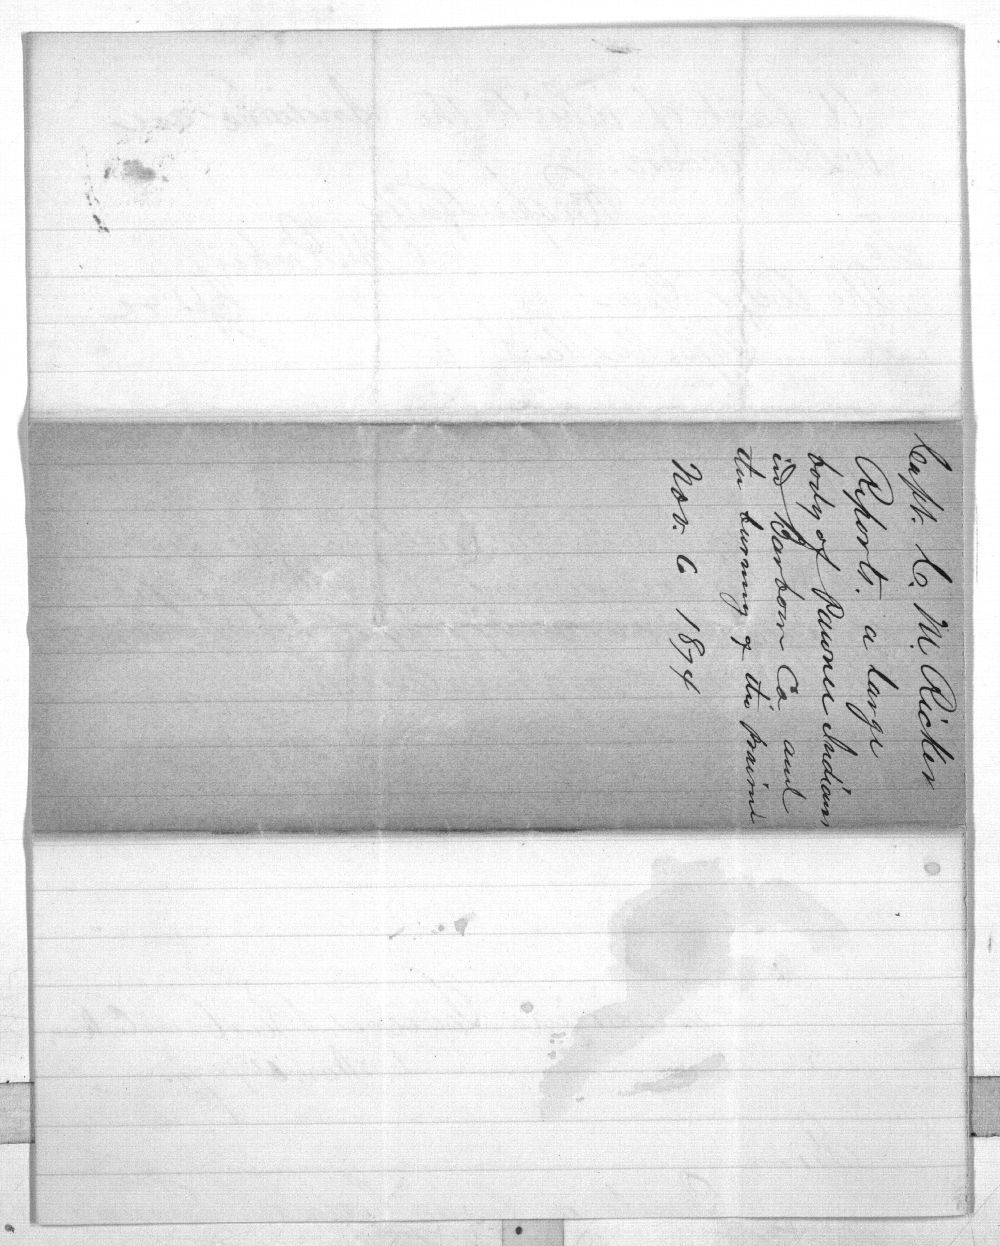 C. M. Ricker to Charles Morris - 3